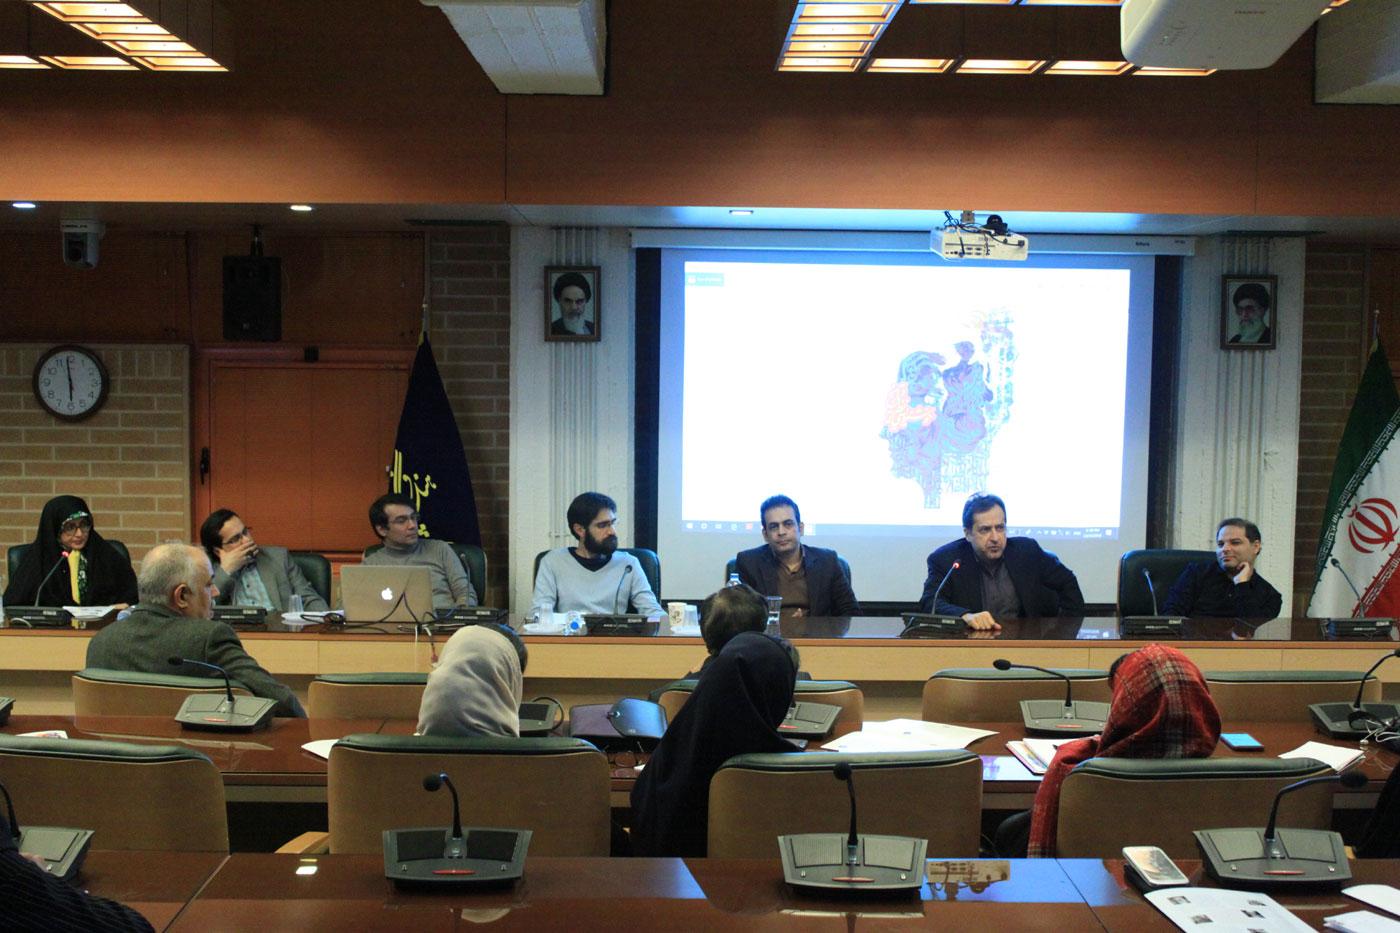 سیر تحول خوشنویسی اسلامی بررسی شد